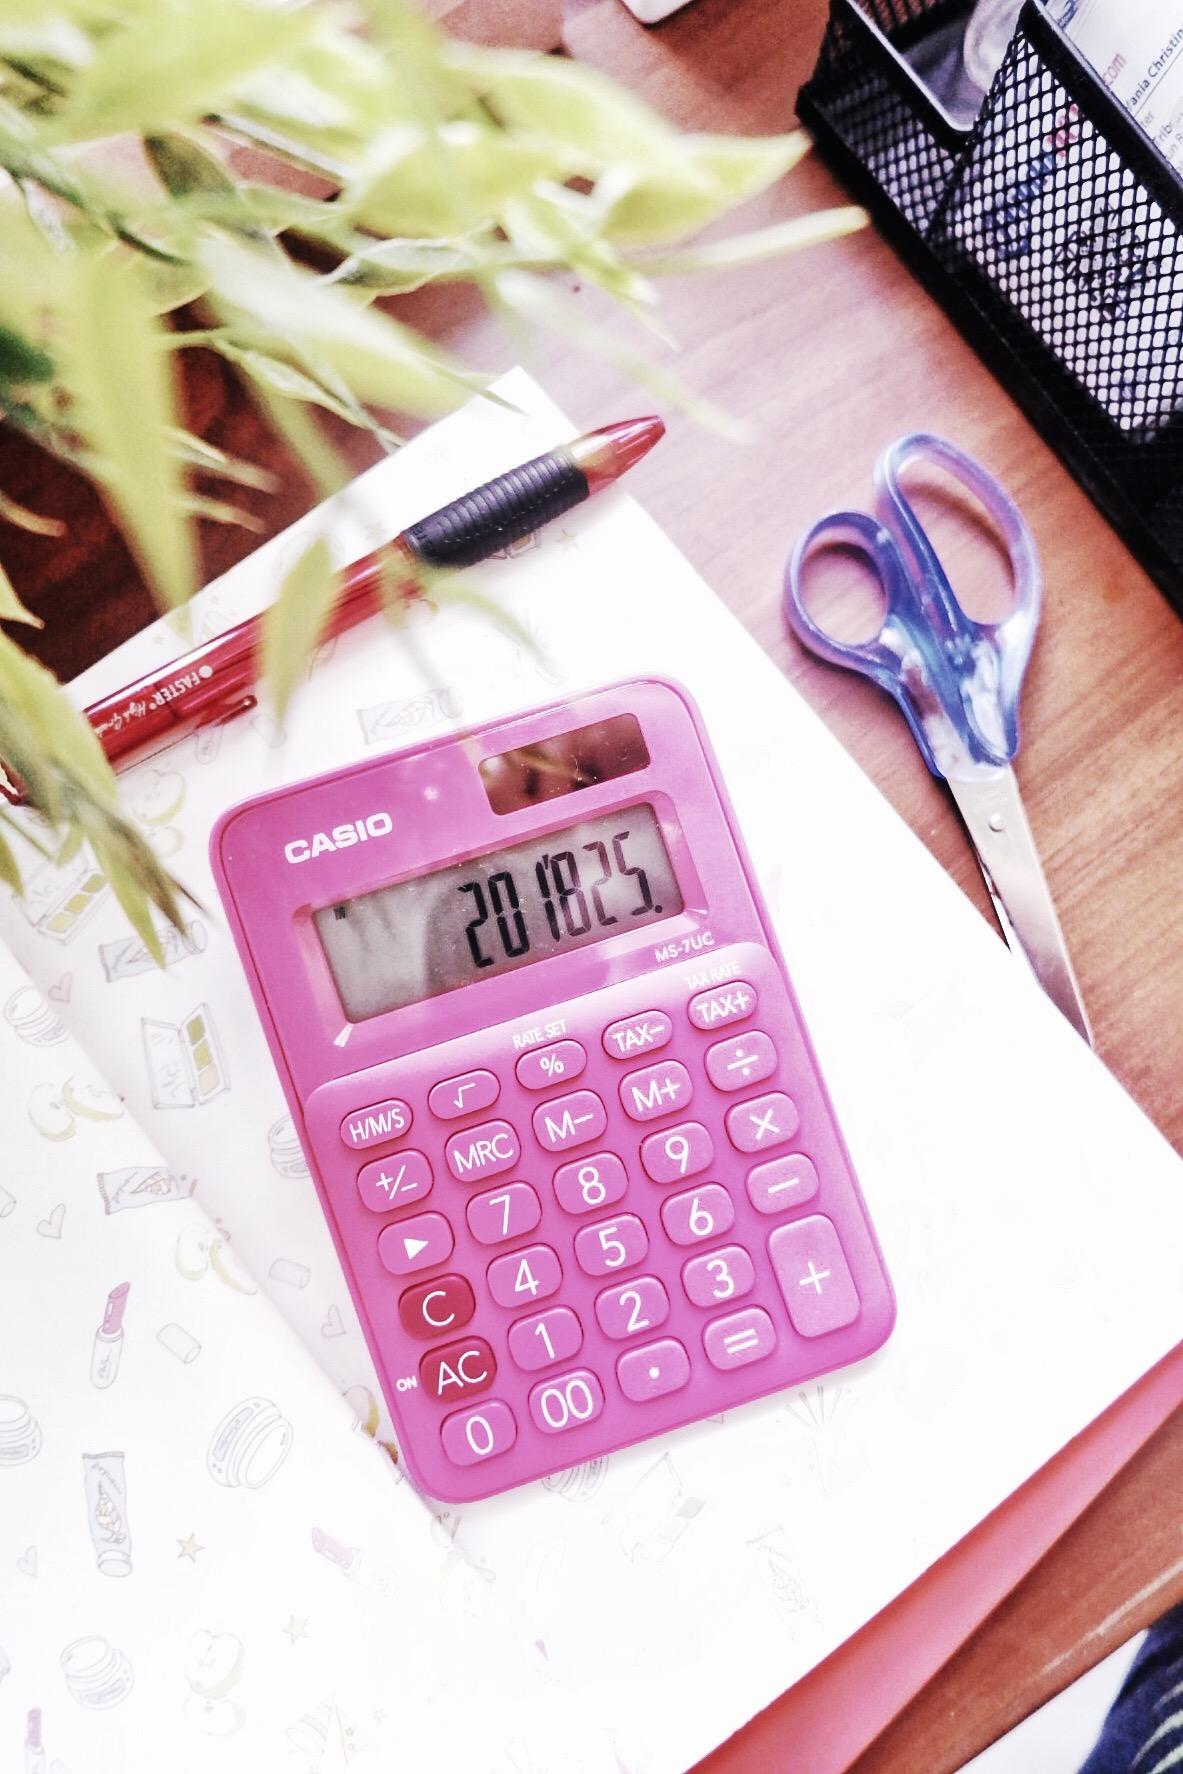 ruthvcp-casio-my-style-colorful-calculator-6.JPG